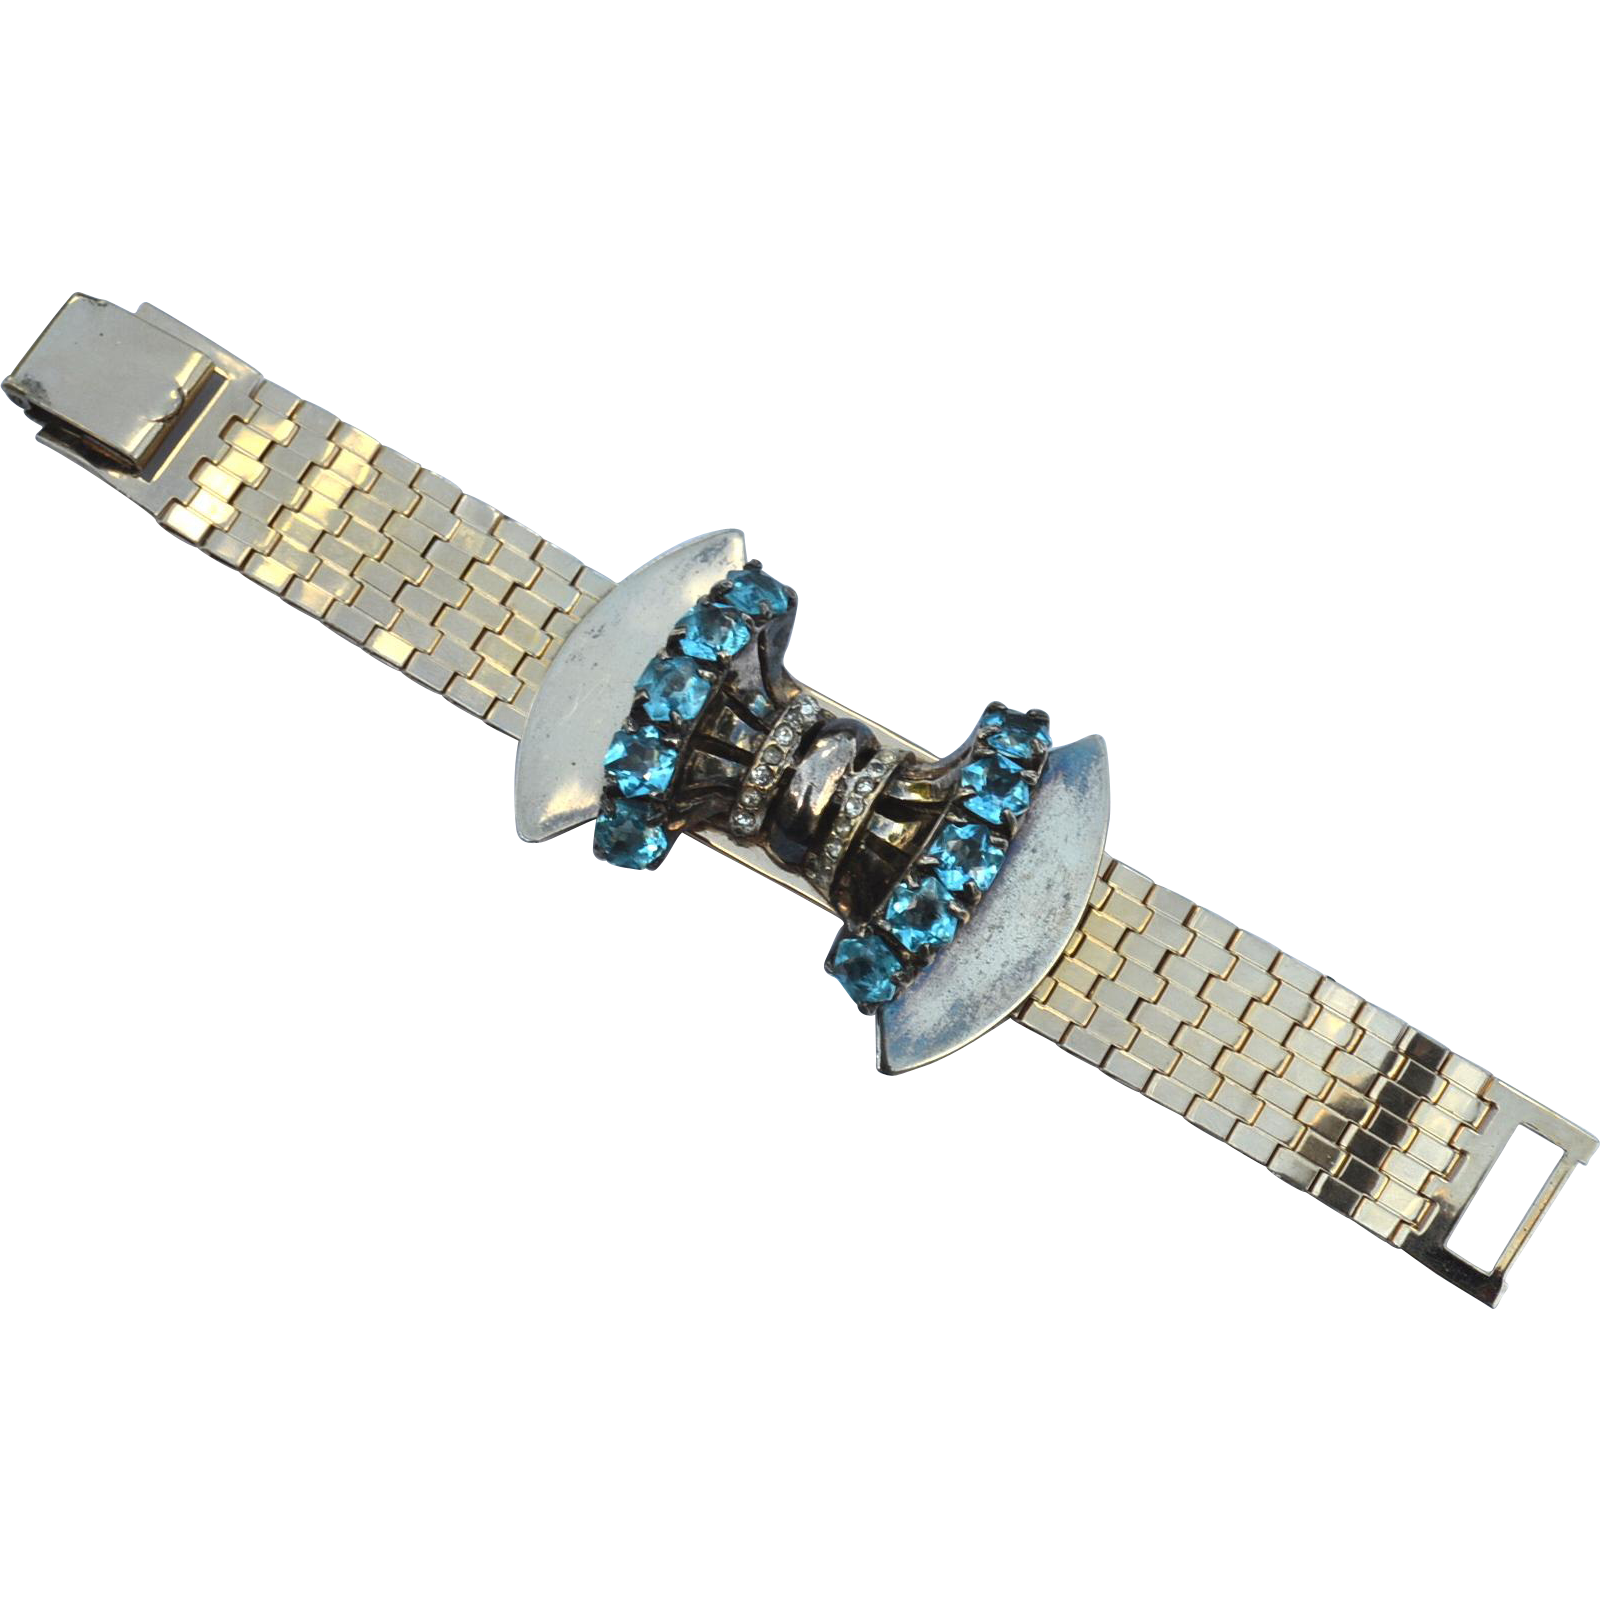 Deco Era, Early Vintage Sceptron 12K Gold Filled Bracelet, Blue Stones, Book Piece